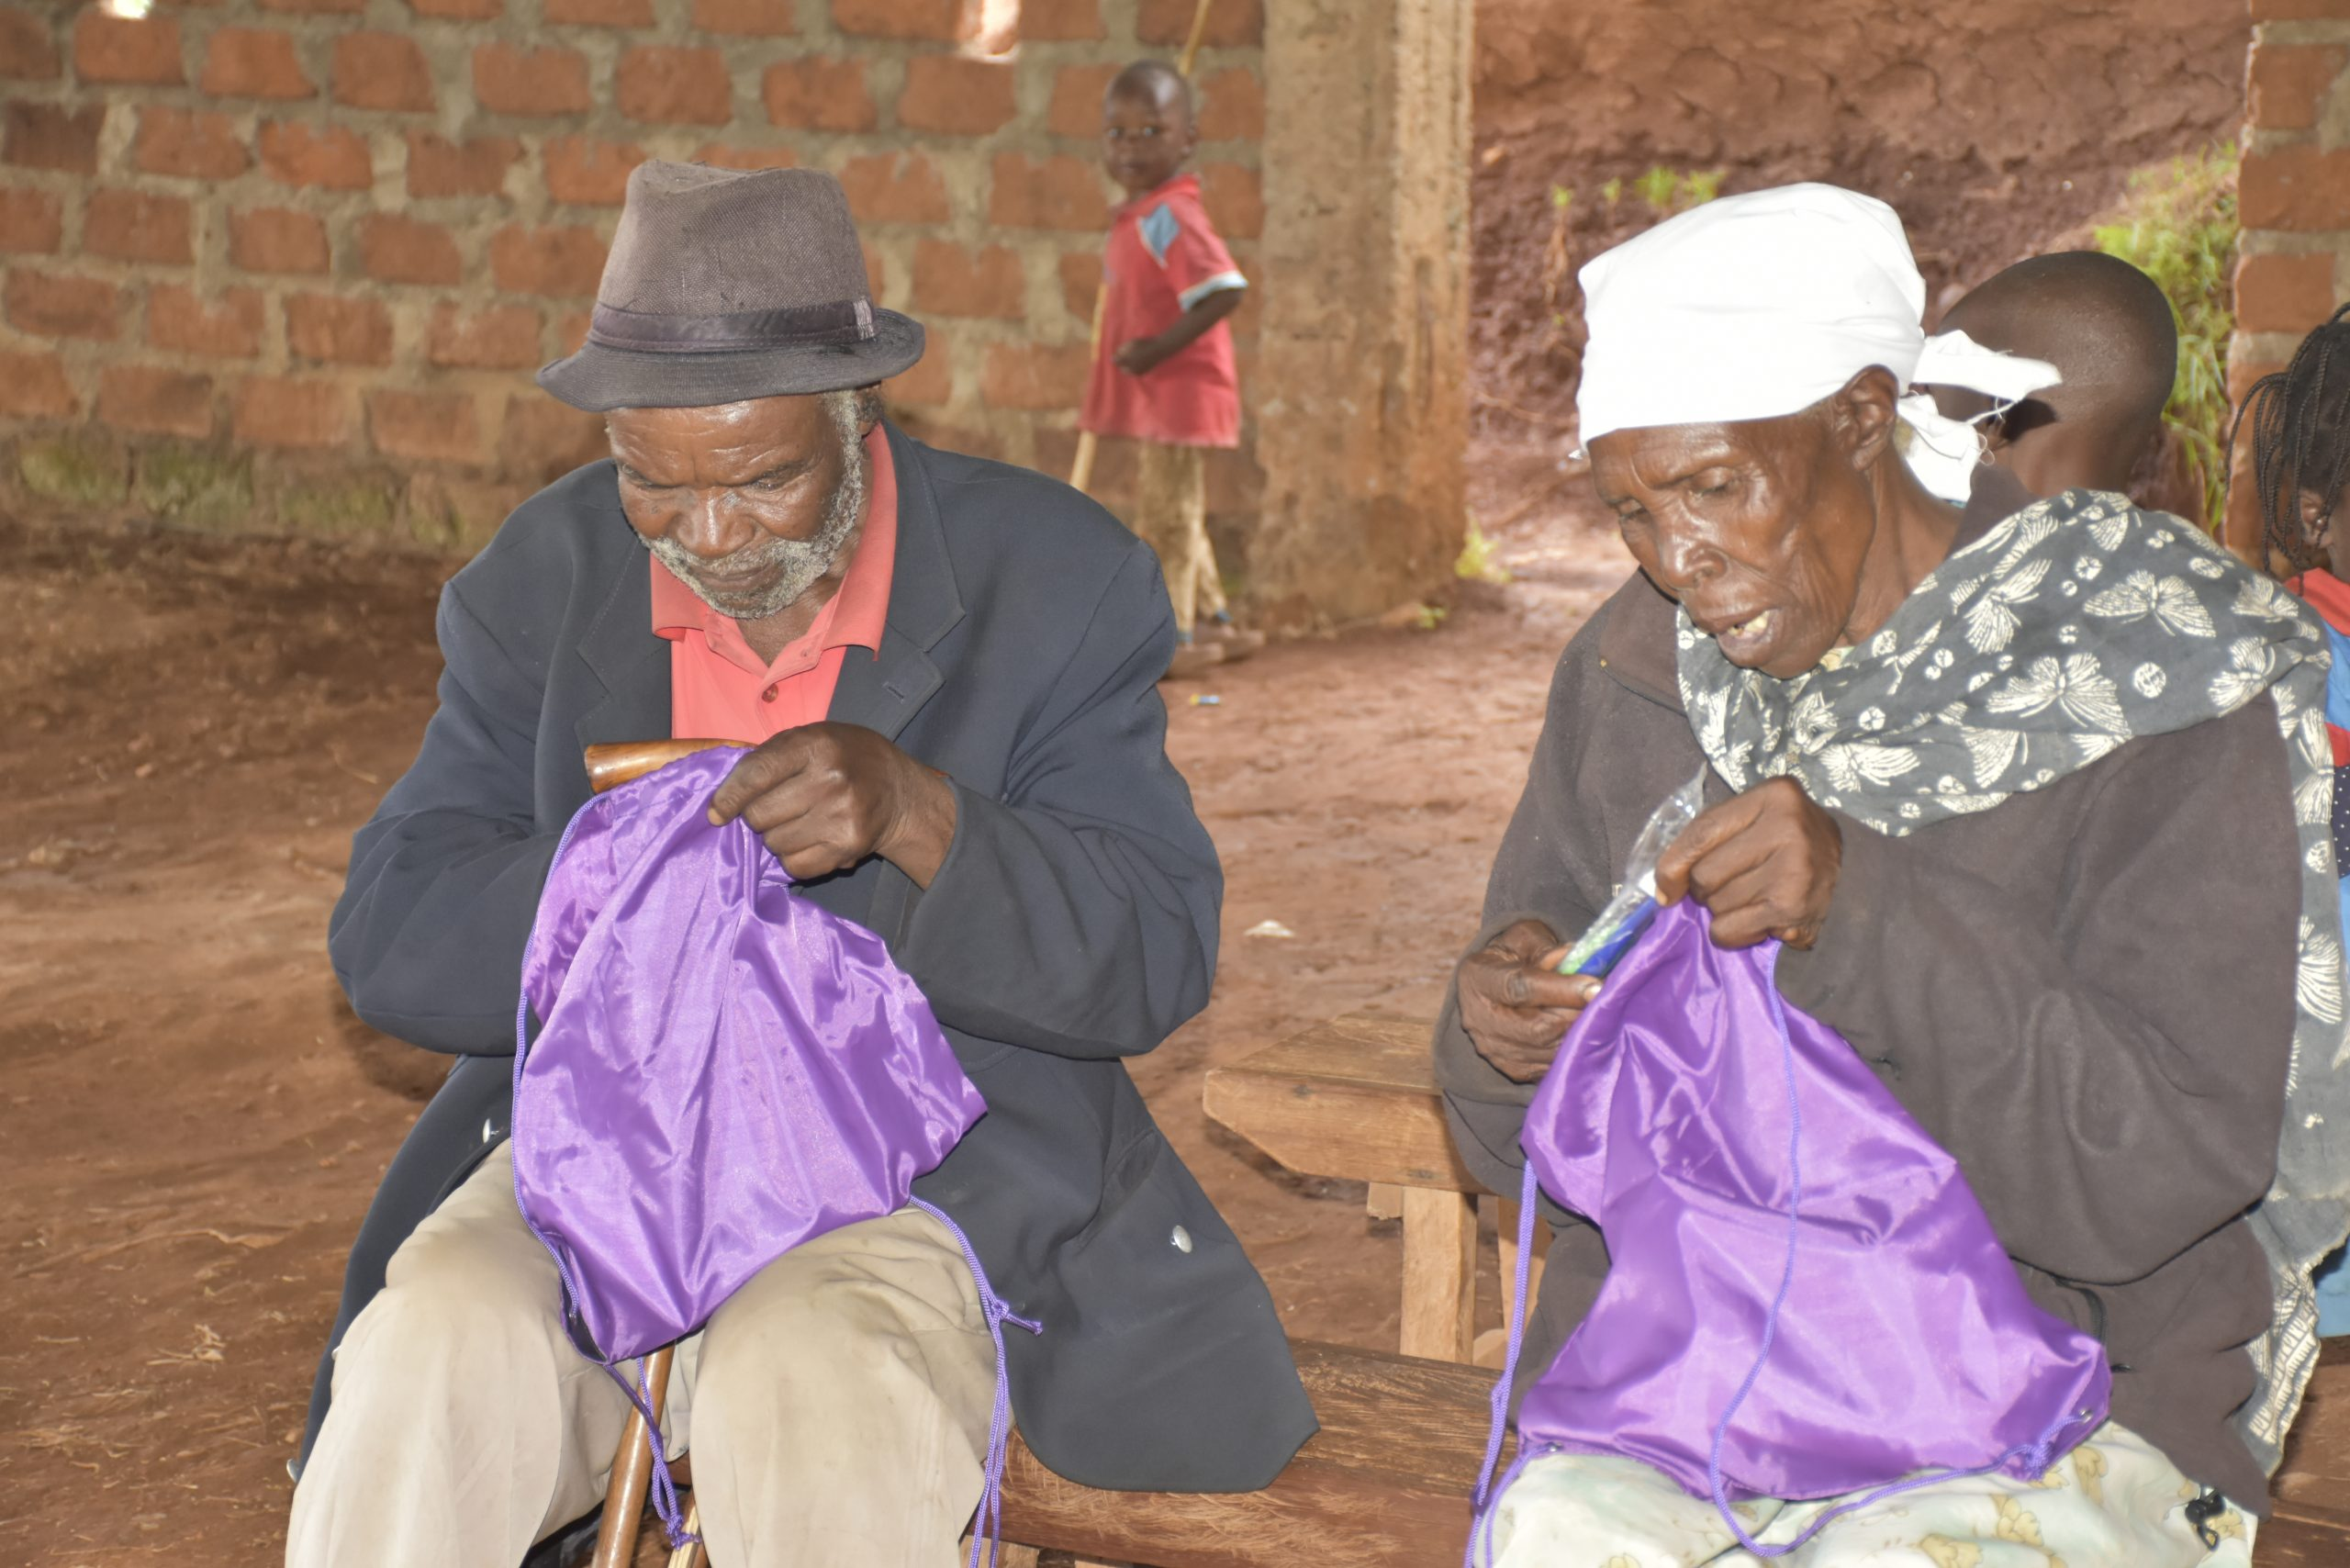 Elderly locals looking into goodies bags in Nyamarambe www.businesstoday.co.ke